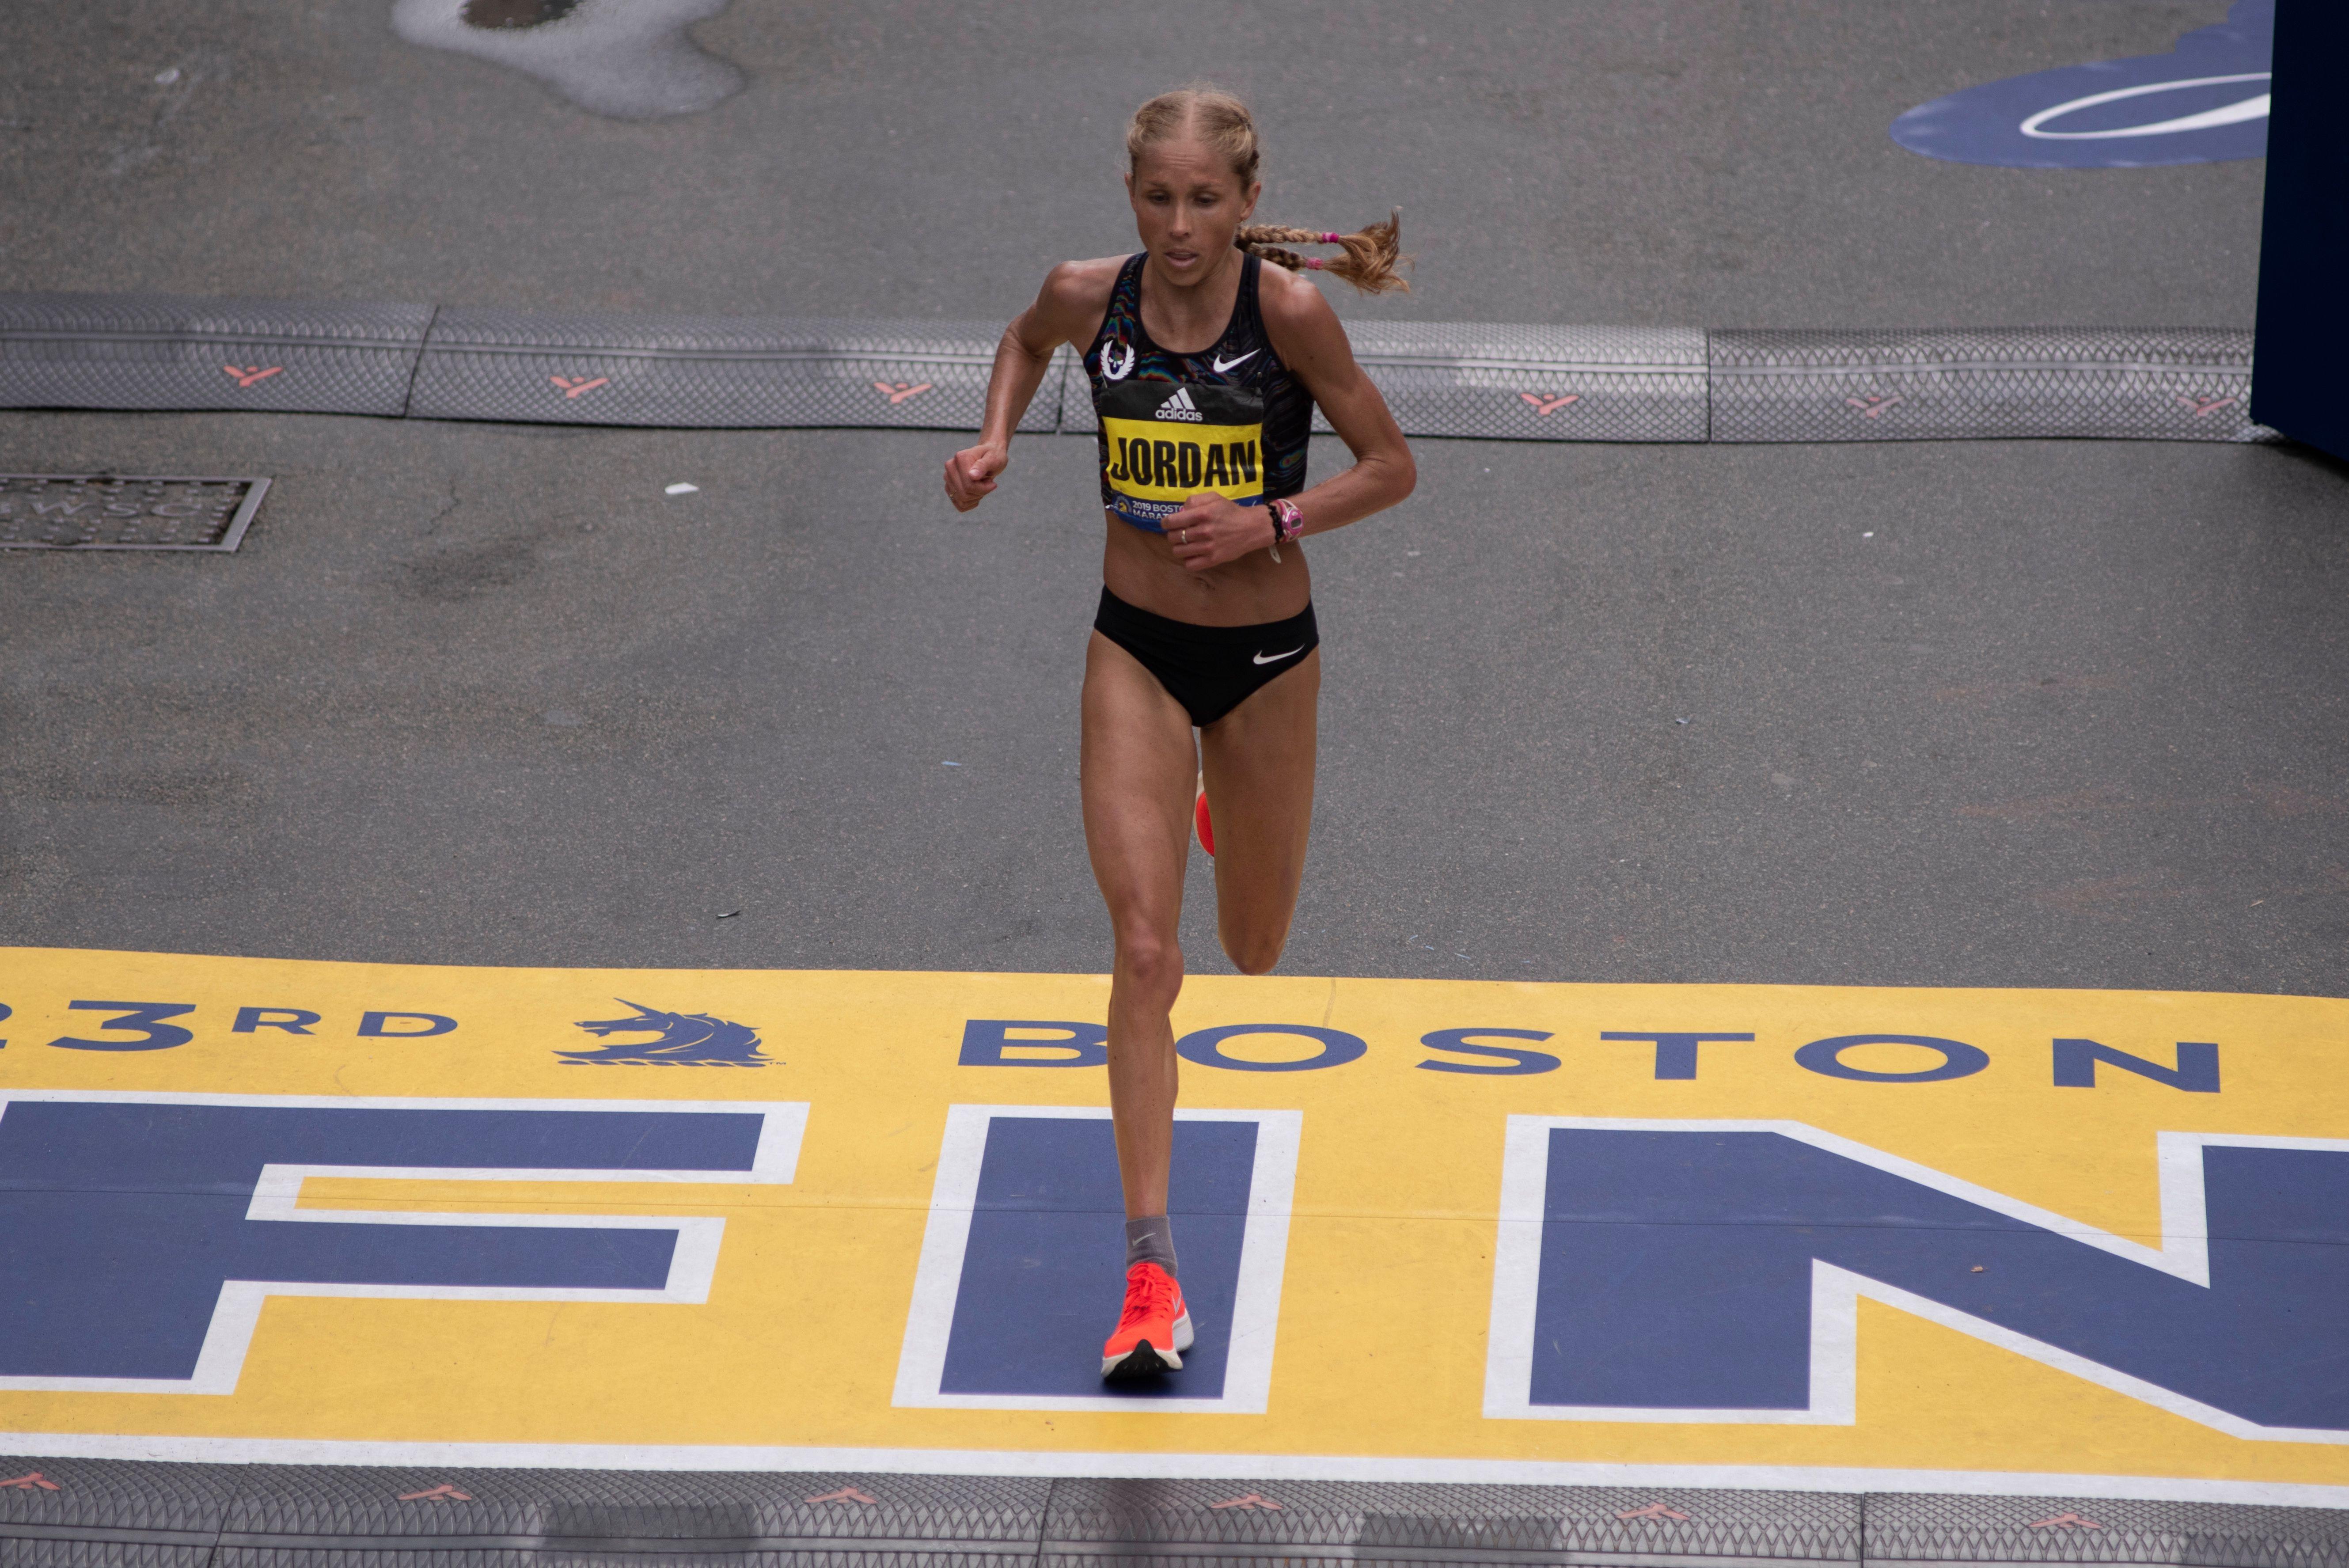 Paula Radcliffe to coach US marathon runner, Jordan Hasay